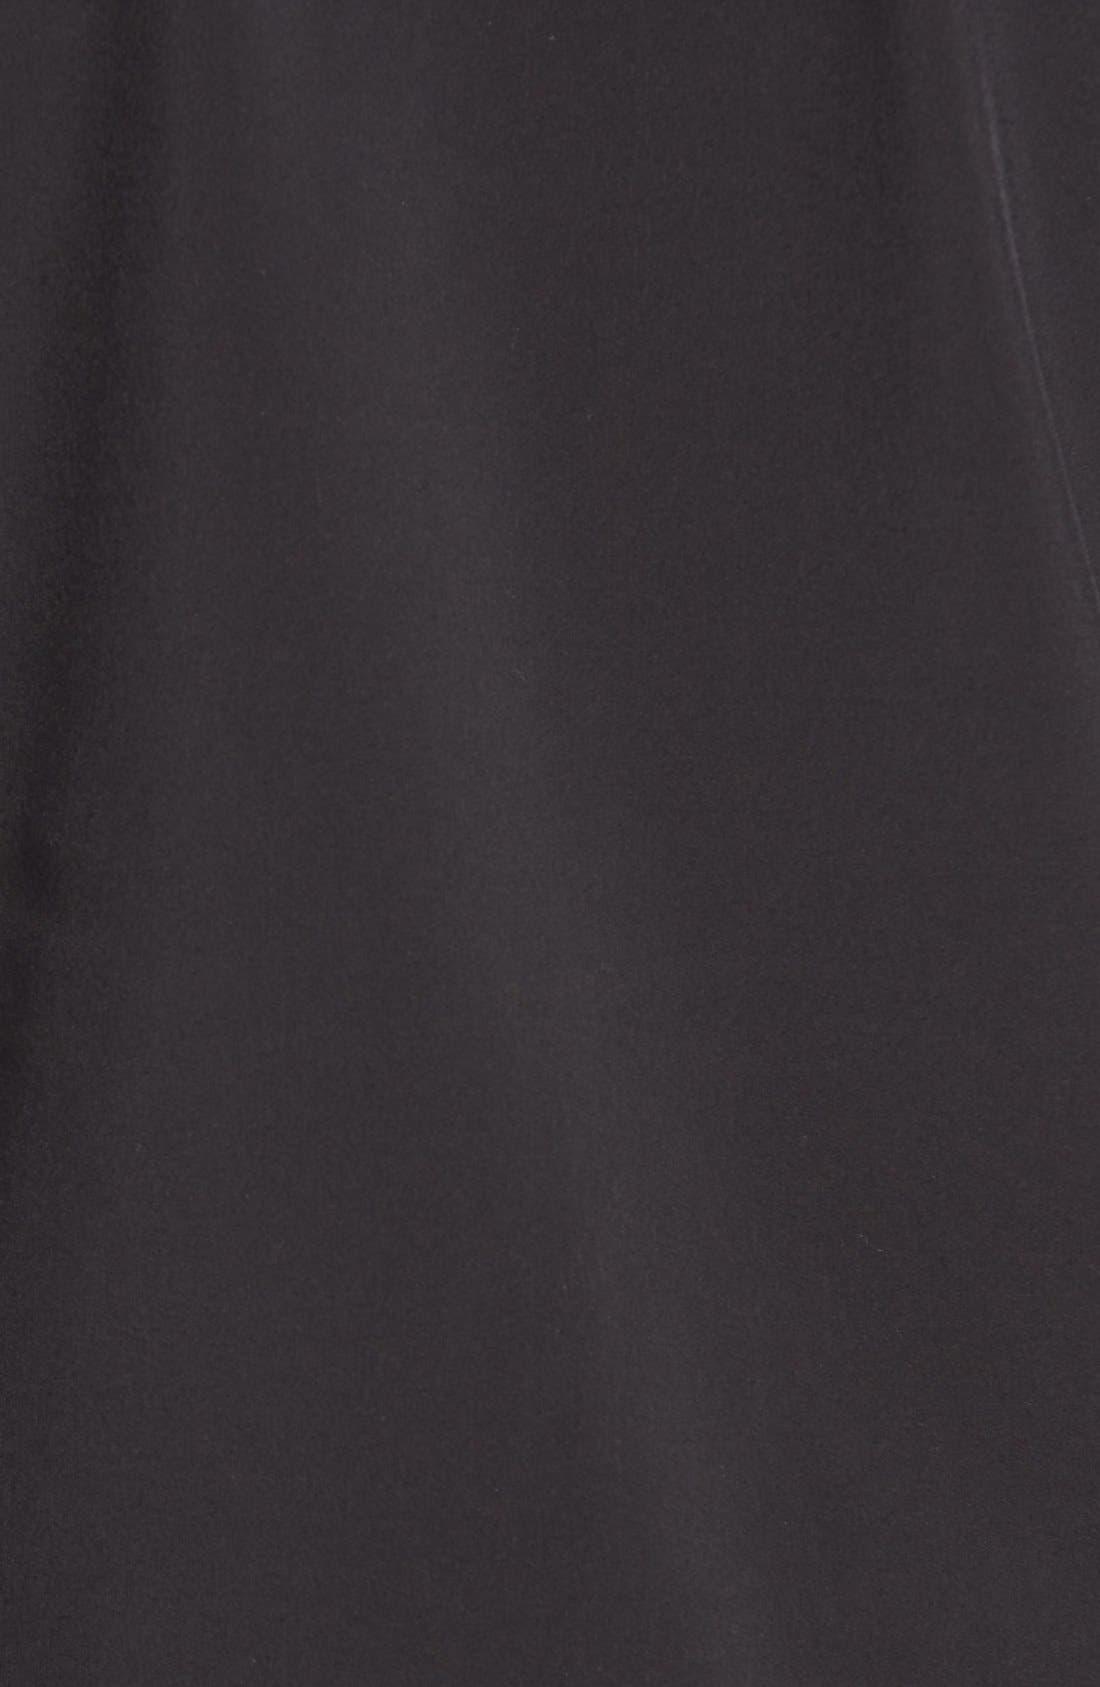 'Apex Bionic 2' Water Repellent Jacket,                             Alternate thumbnail 5, color,                             Tnf Black